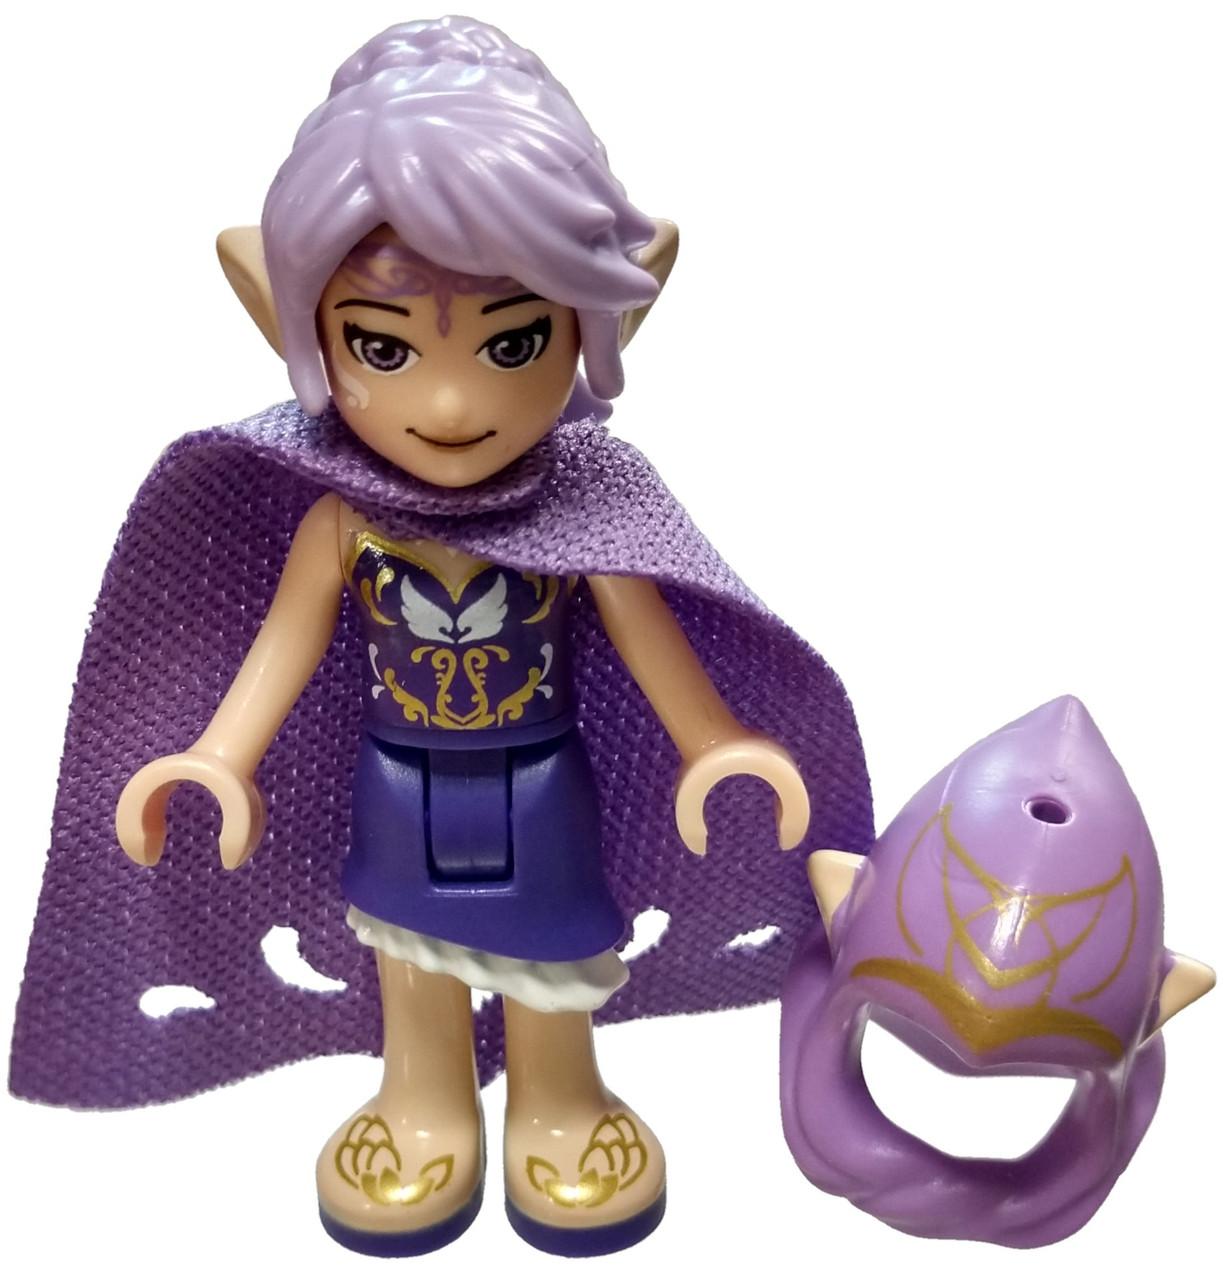 LEGO Elves Minifigure Mini Fig Aira Windwhistler